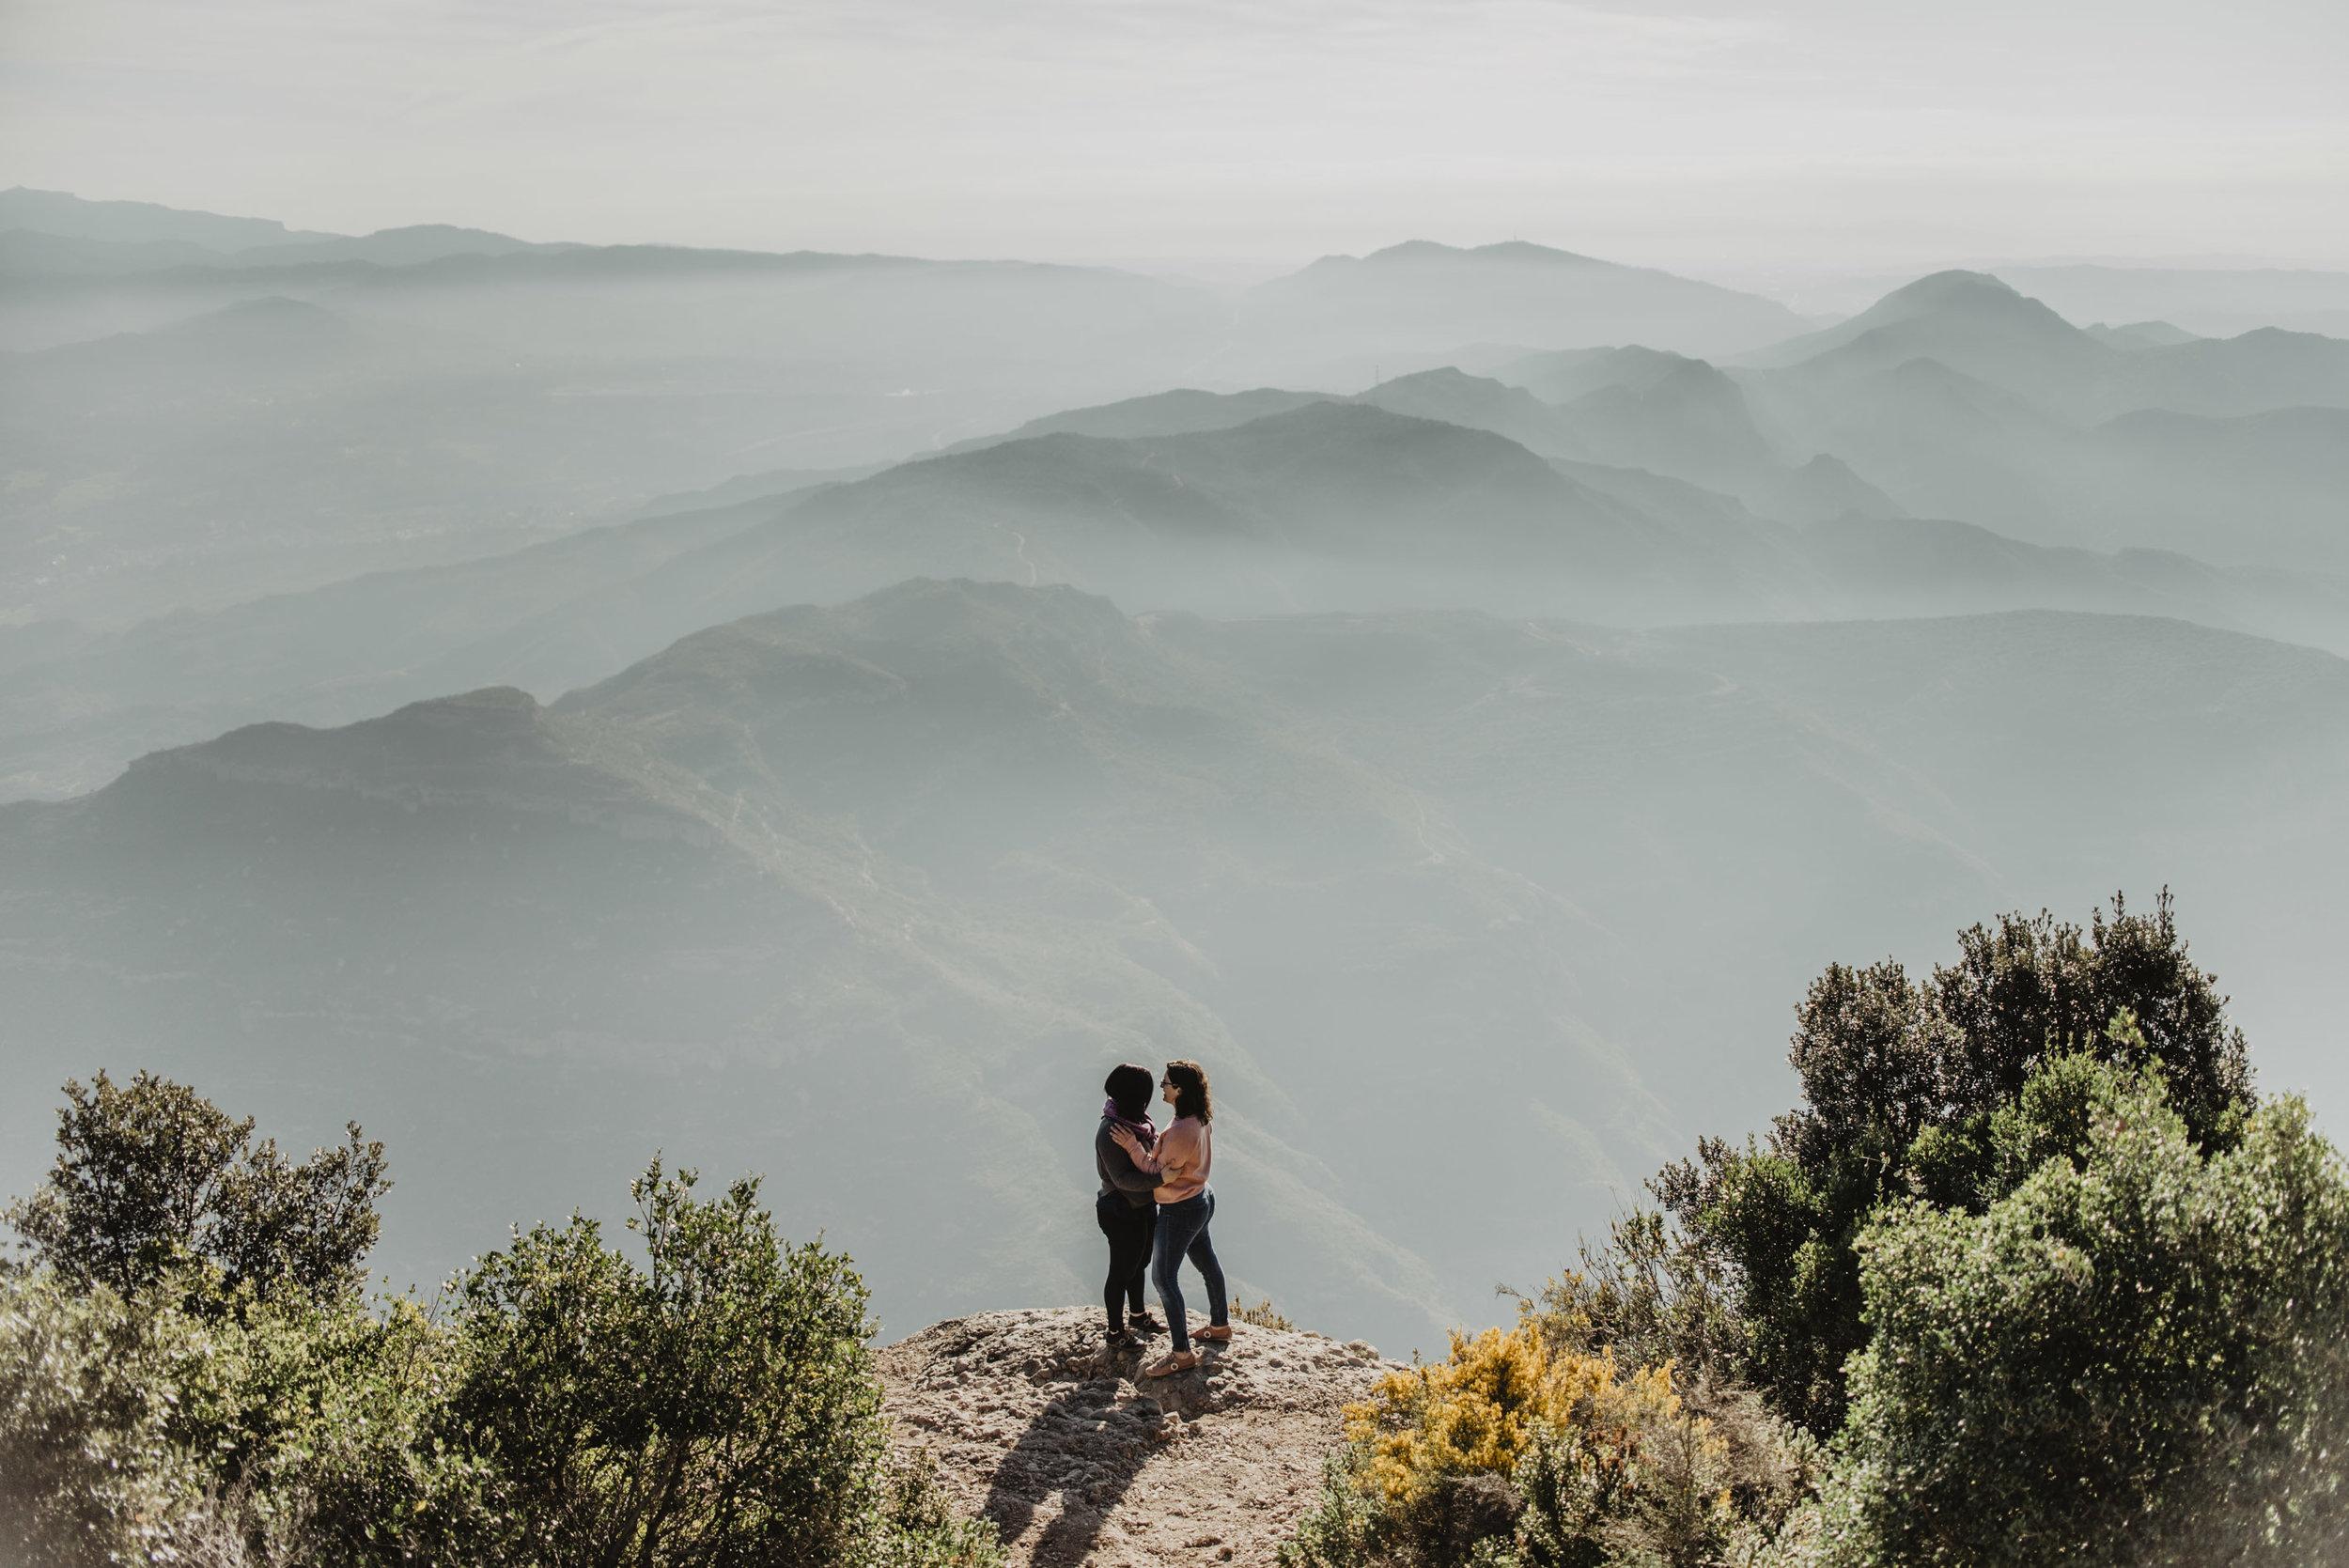 pareja-montserrat-mia-moments-photo-fotografia-sesión-fotos-chicas-07.jpg